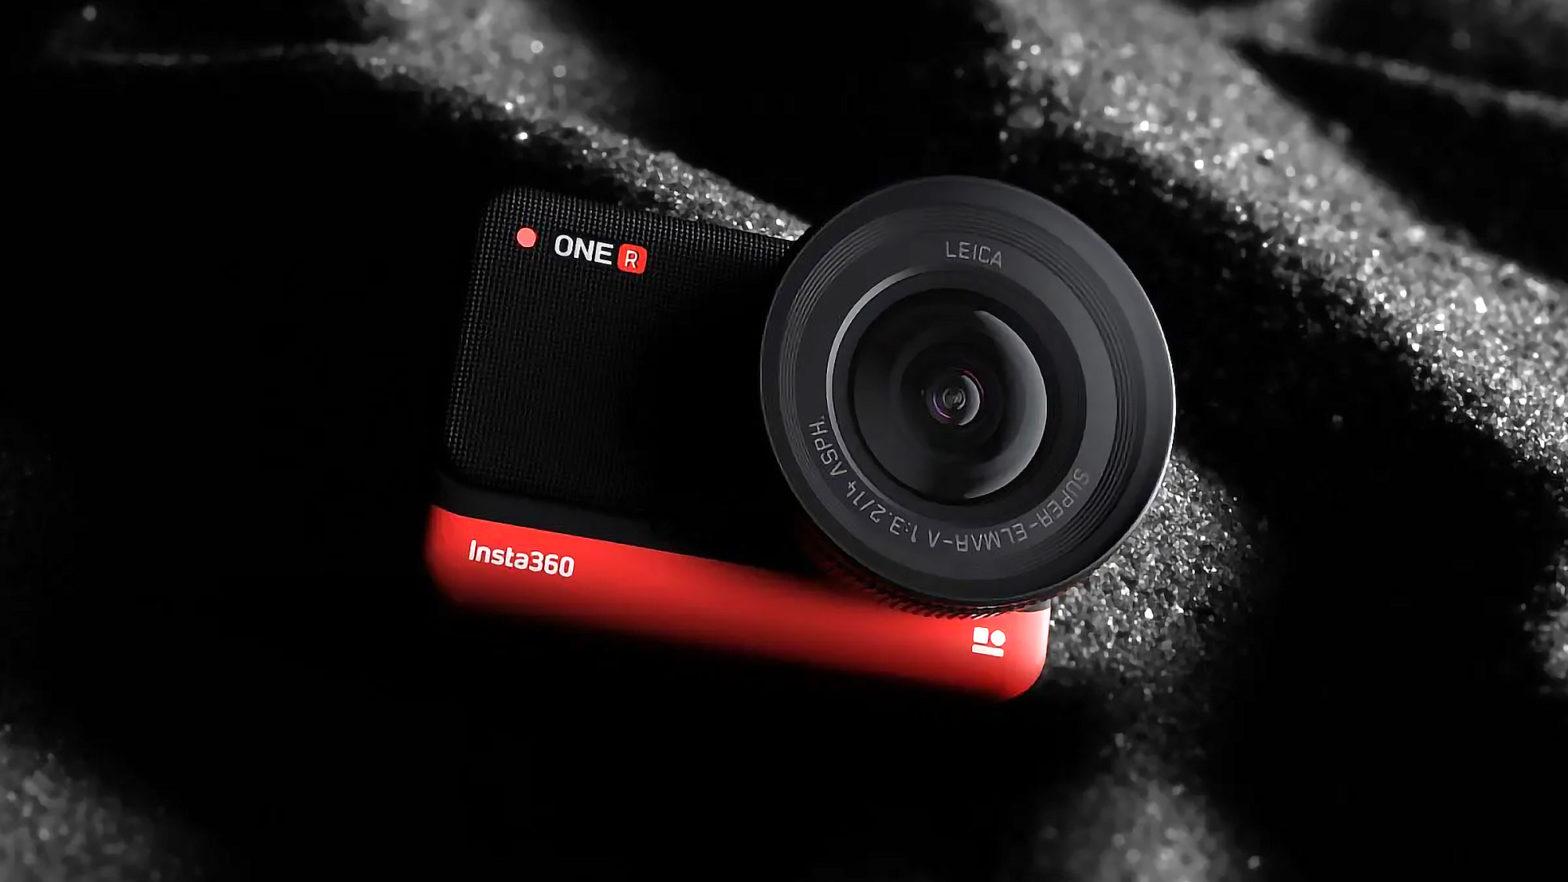 Insta360 ONE R Adaptive Action Camera